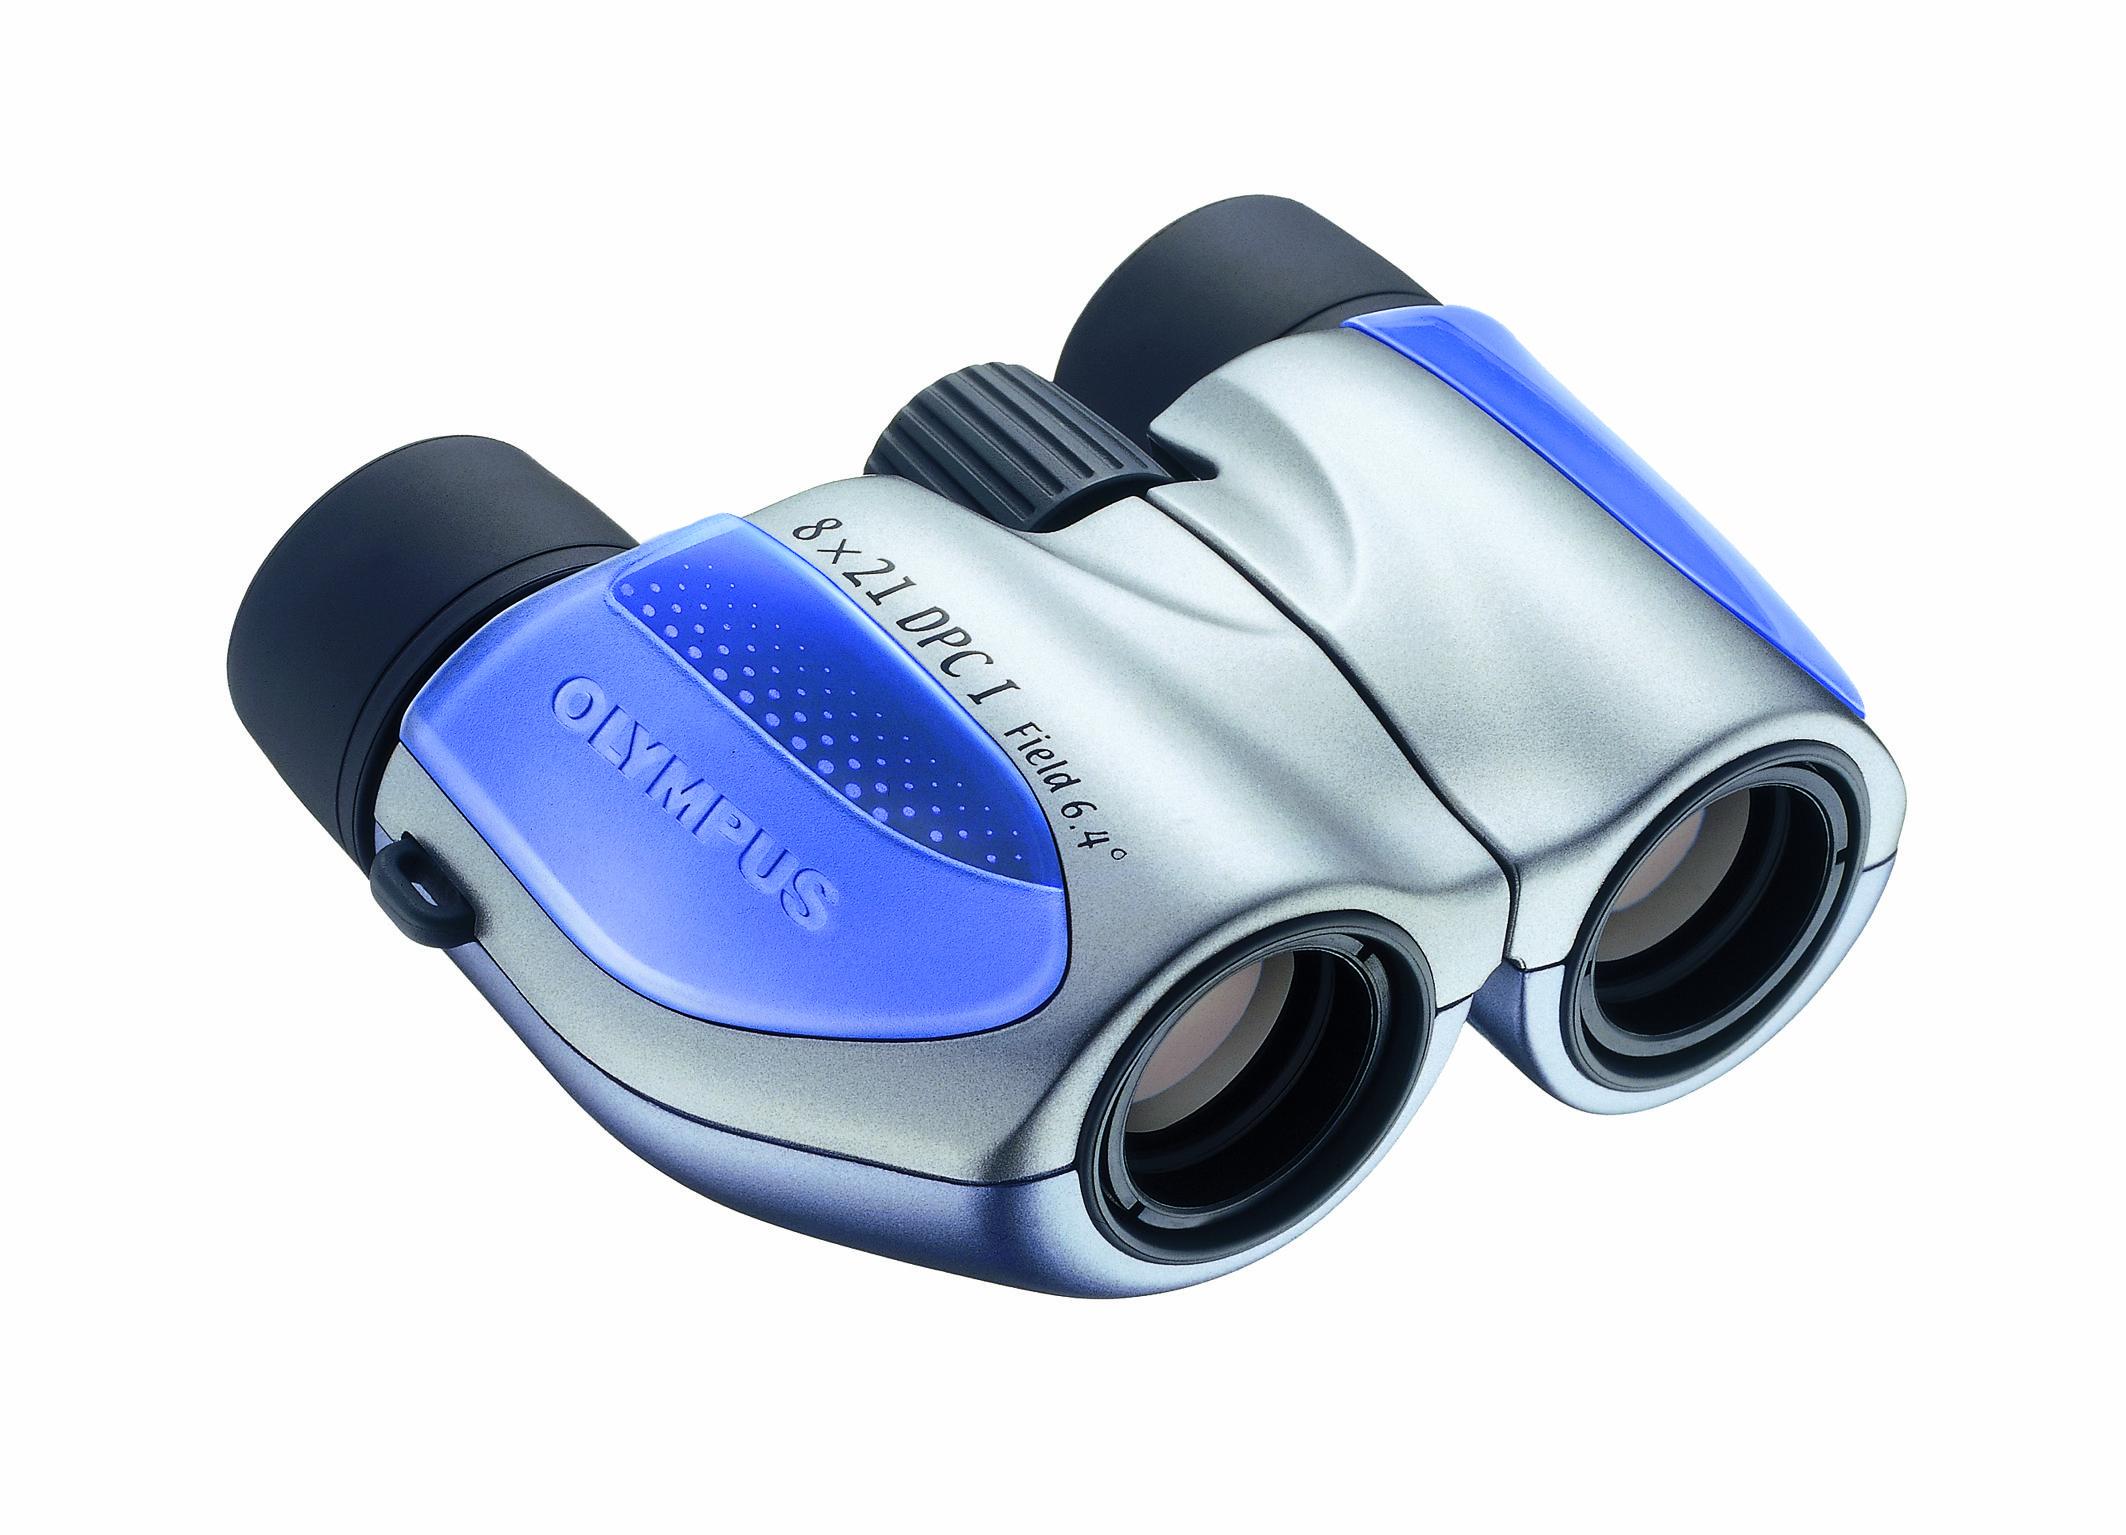 Olympus 8x21 DPC I  Steel-Blue Binoculars - Olympus 9.06.01.01.076